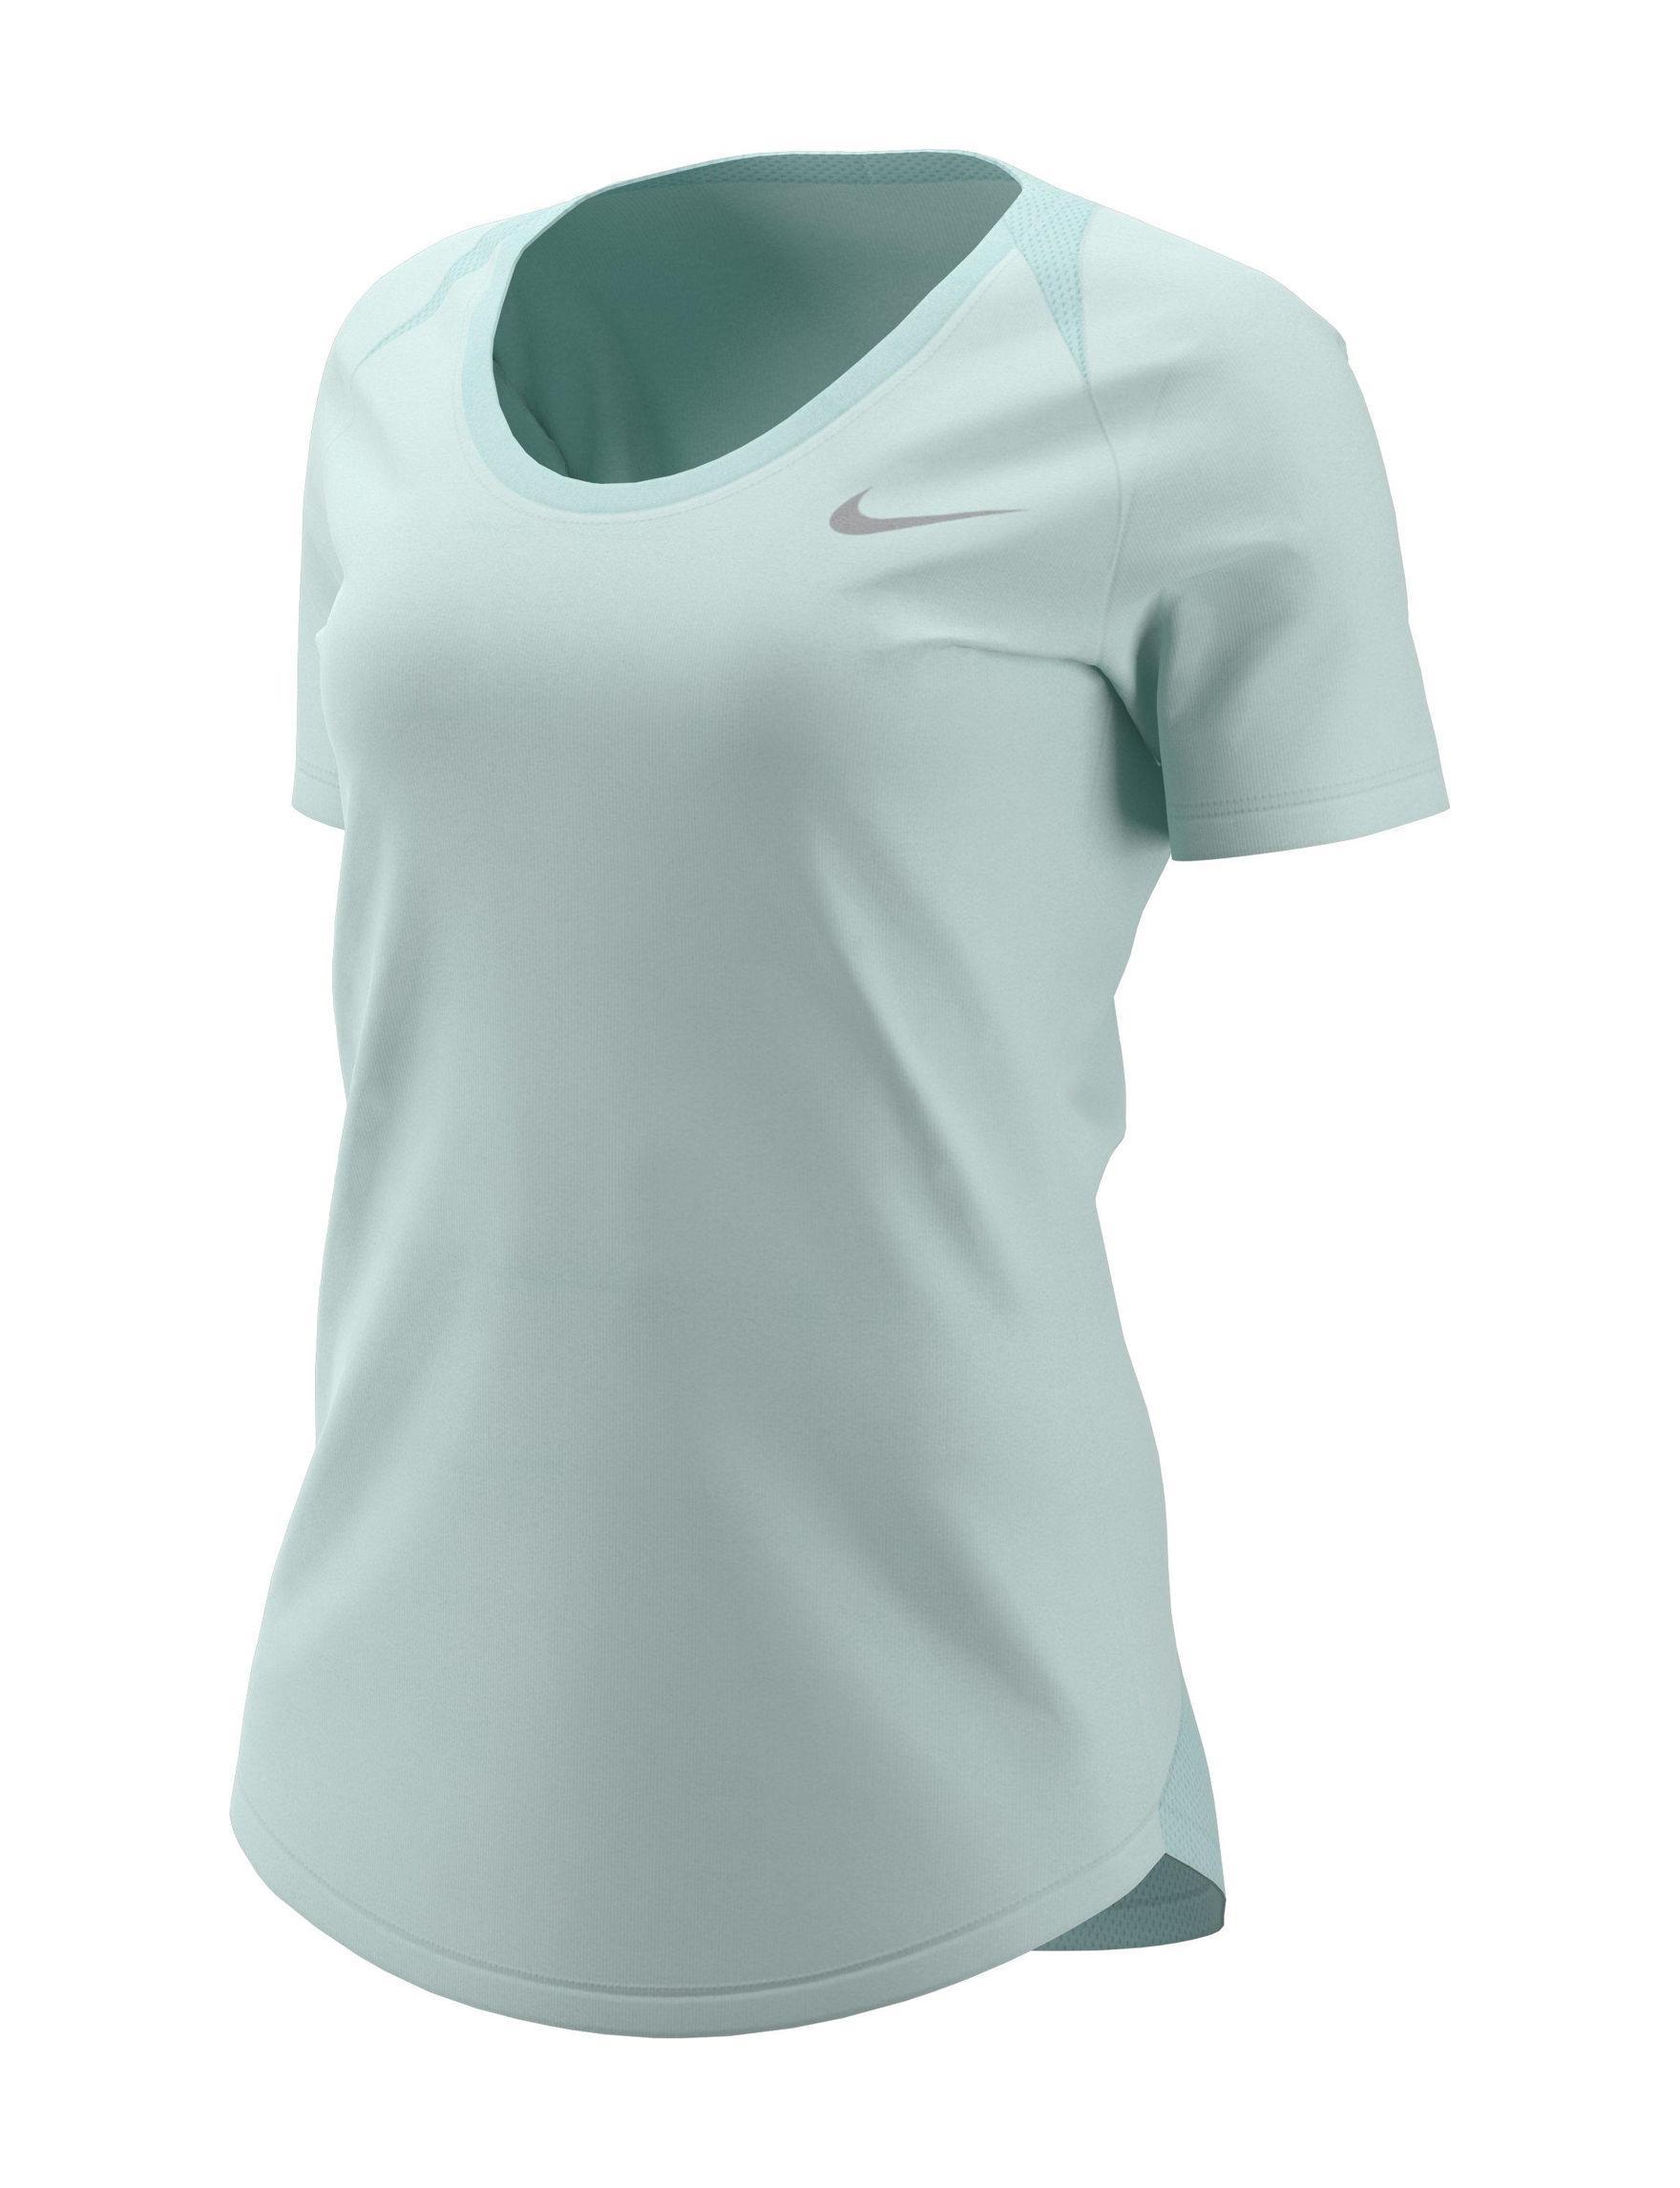 Nike Turquoise Tees & Tanks